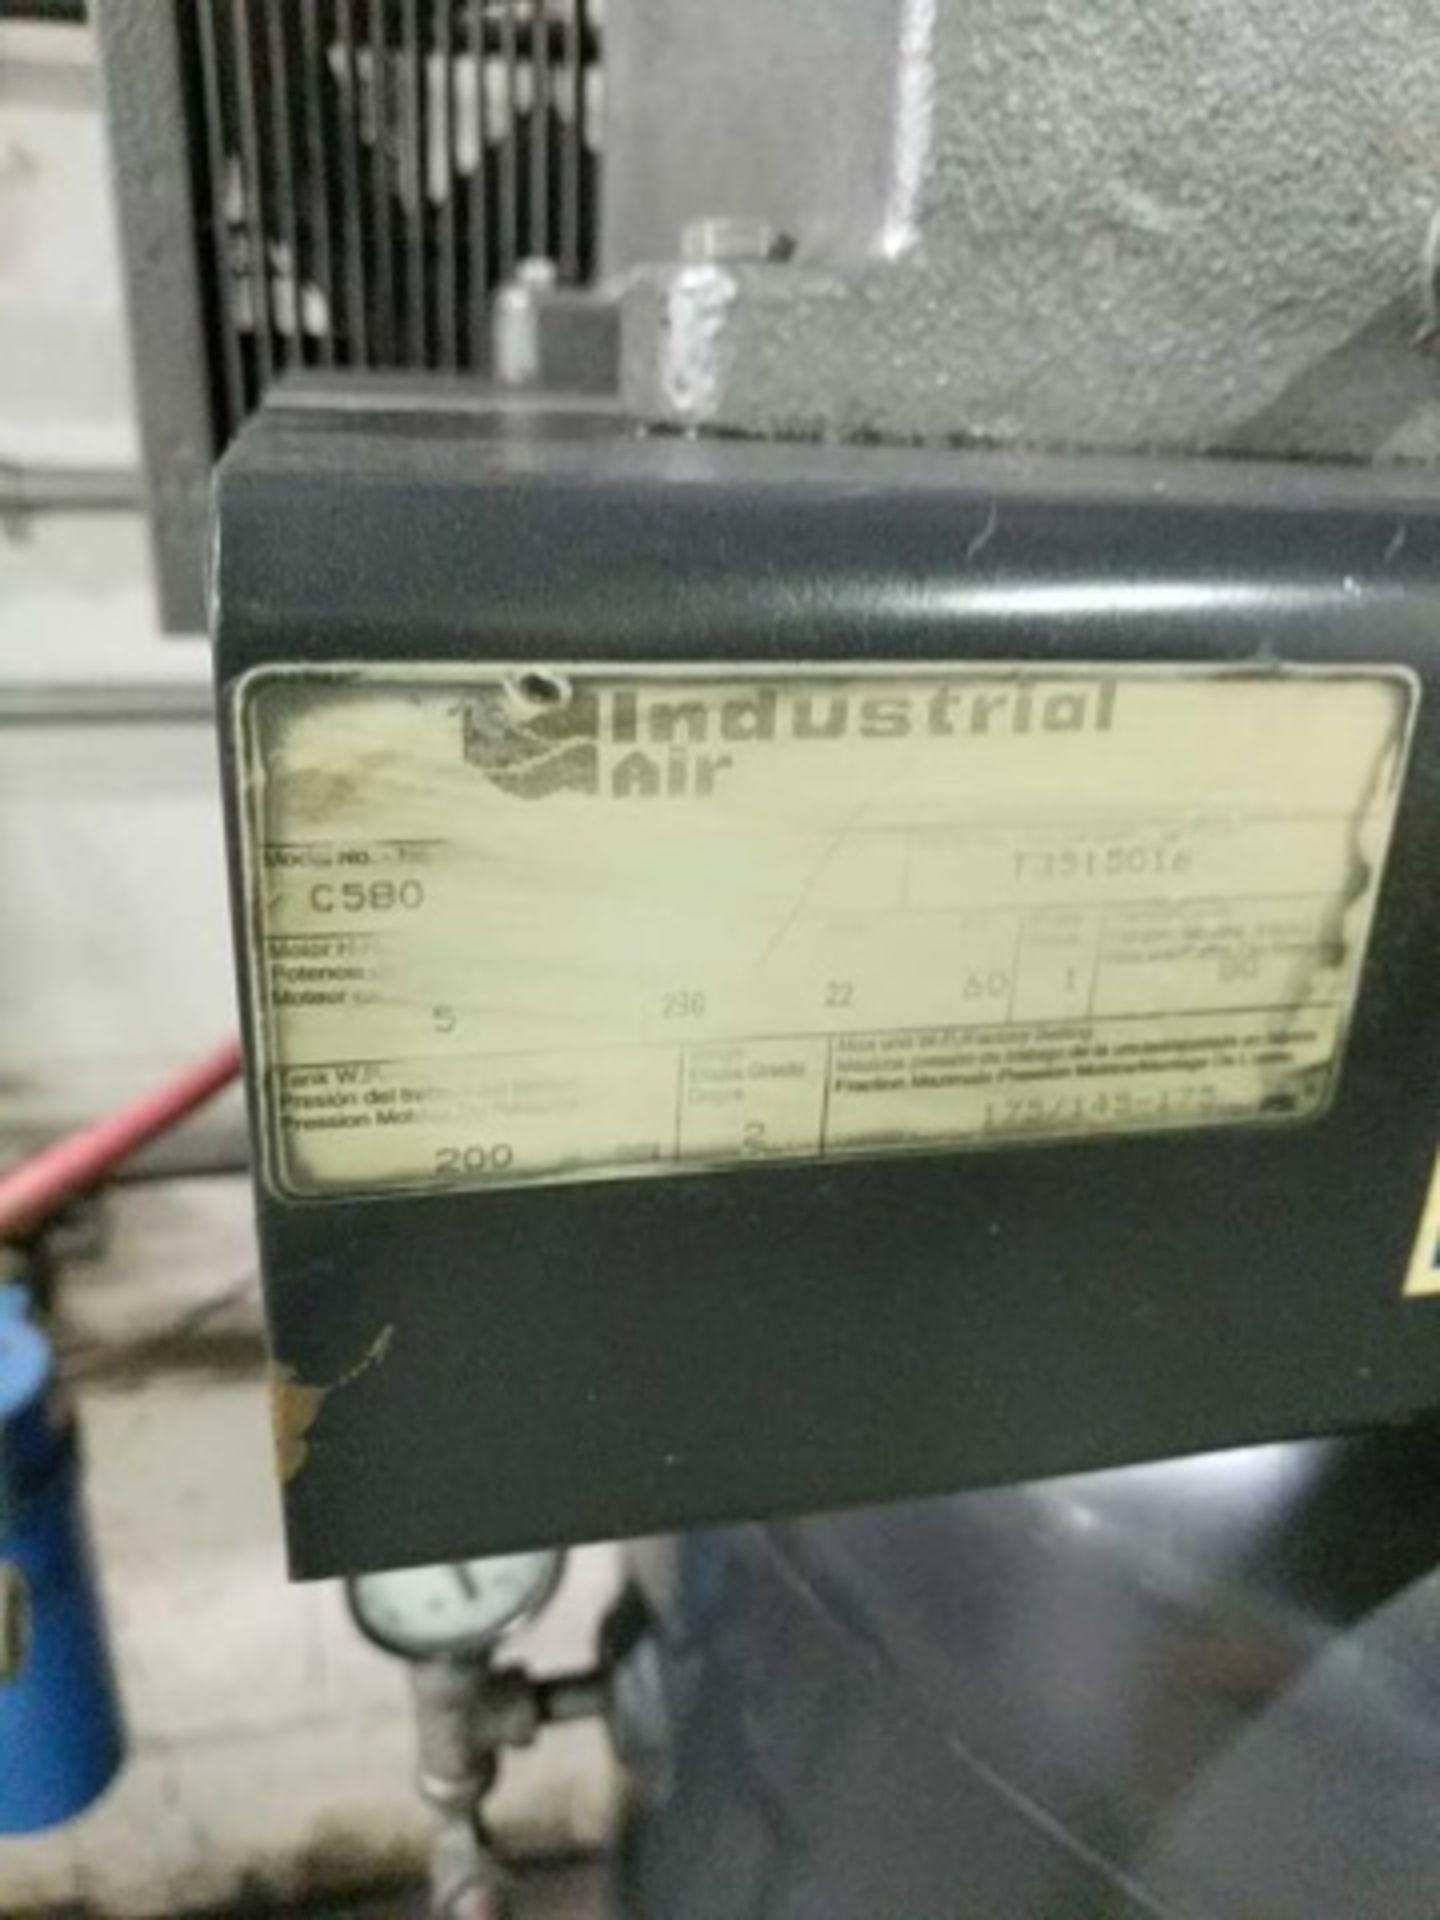 Industrial Air Machine C580 Air Compressor - Image 2 of 7